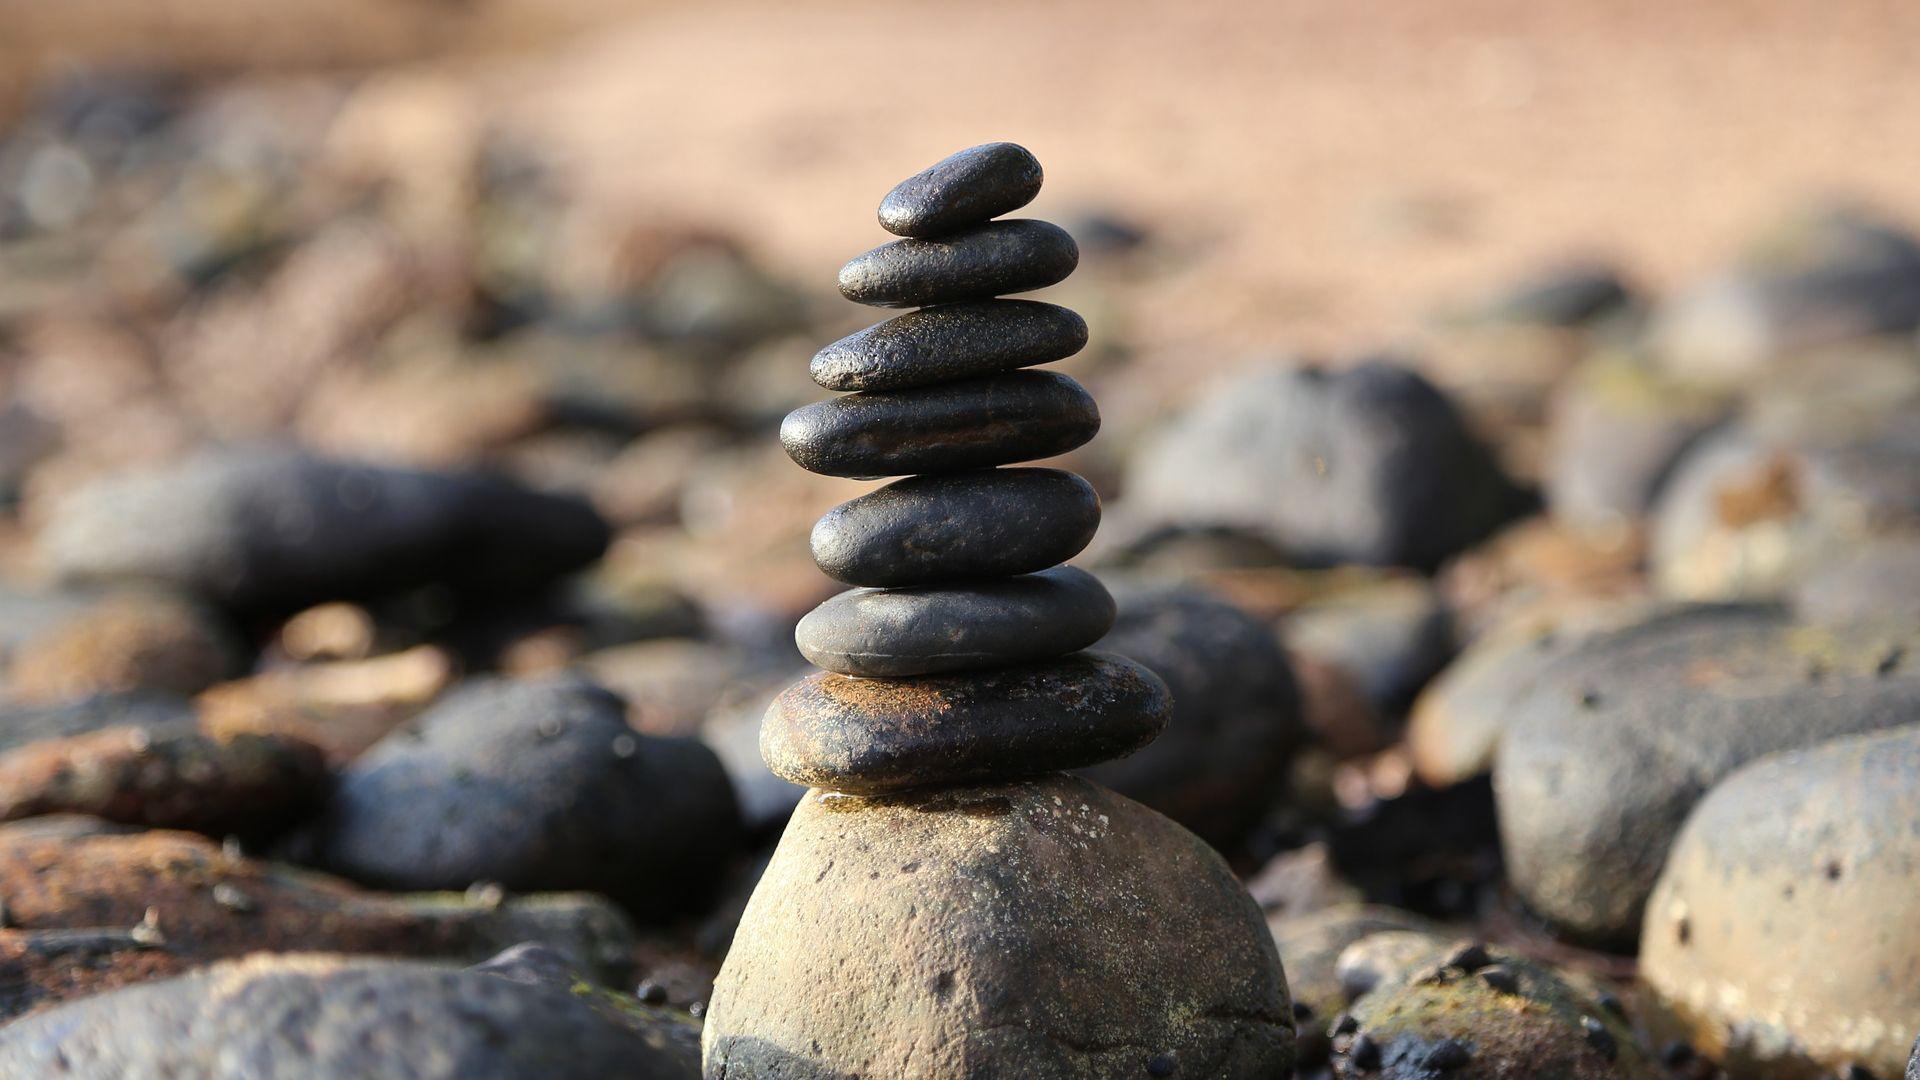 Desktop Wallpaper Stones Tower Balance Hd Image Picture